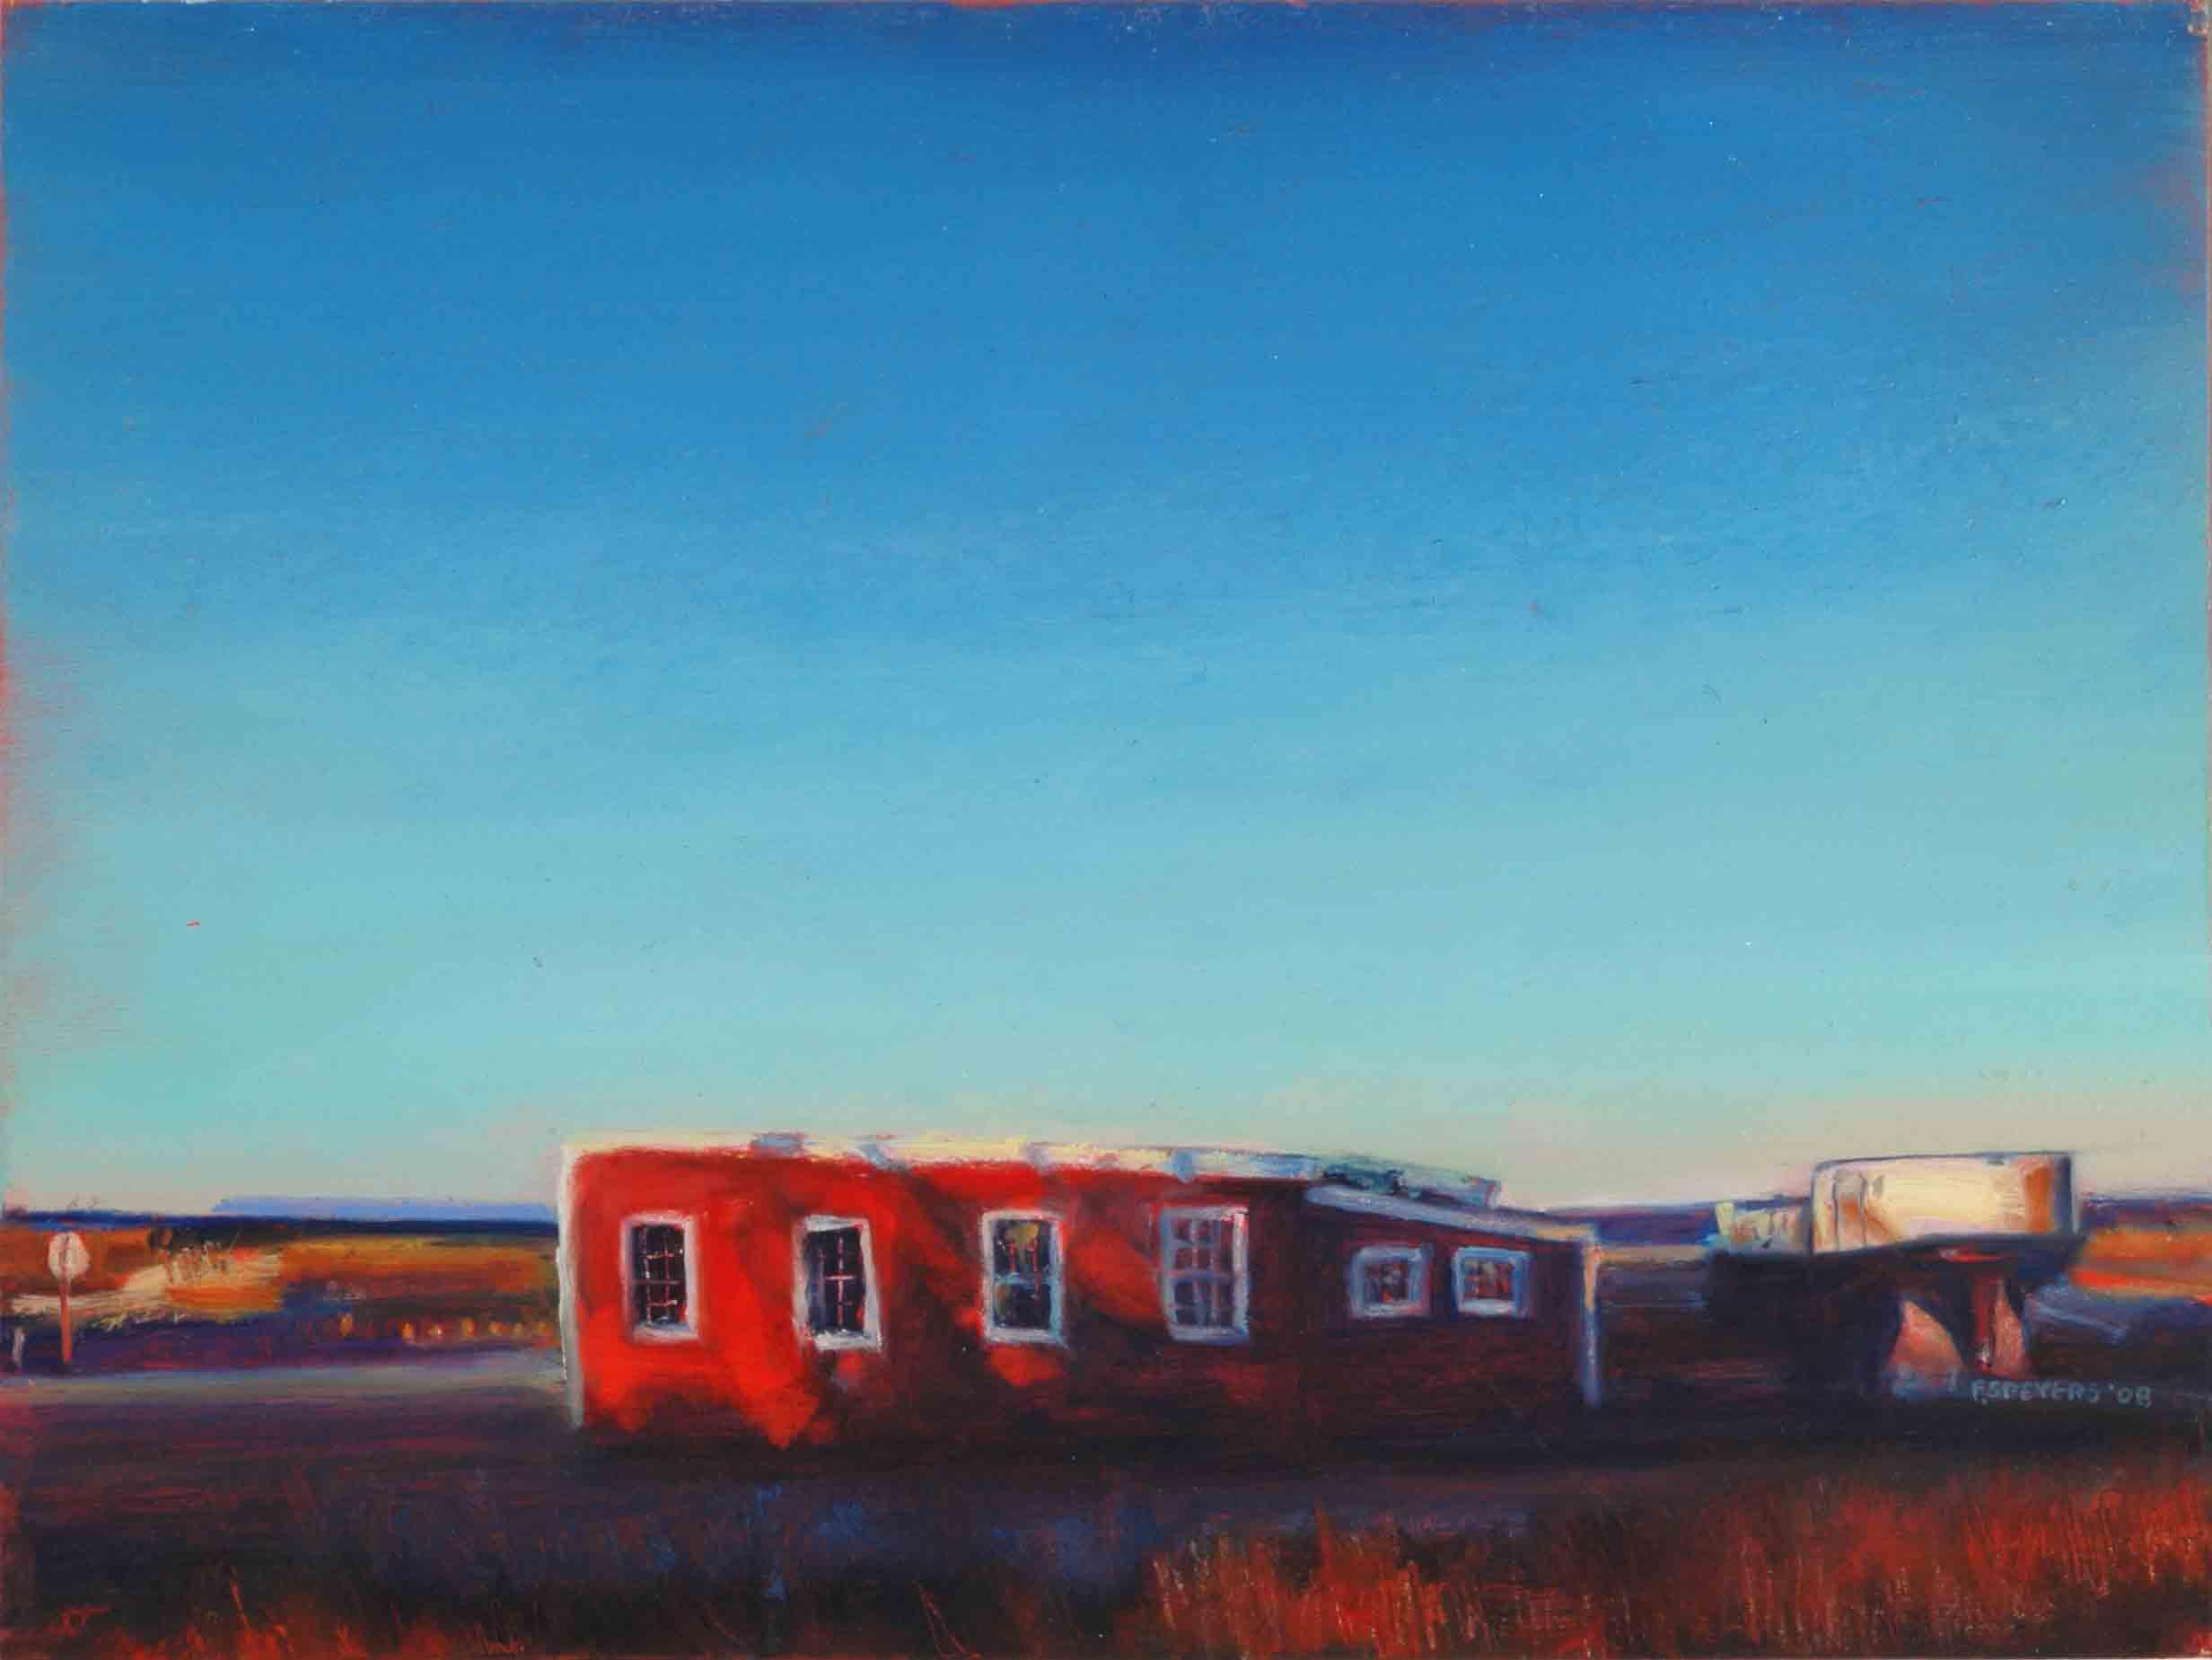 Frank Speyers, Aloha Tug